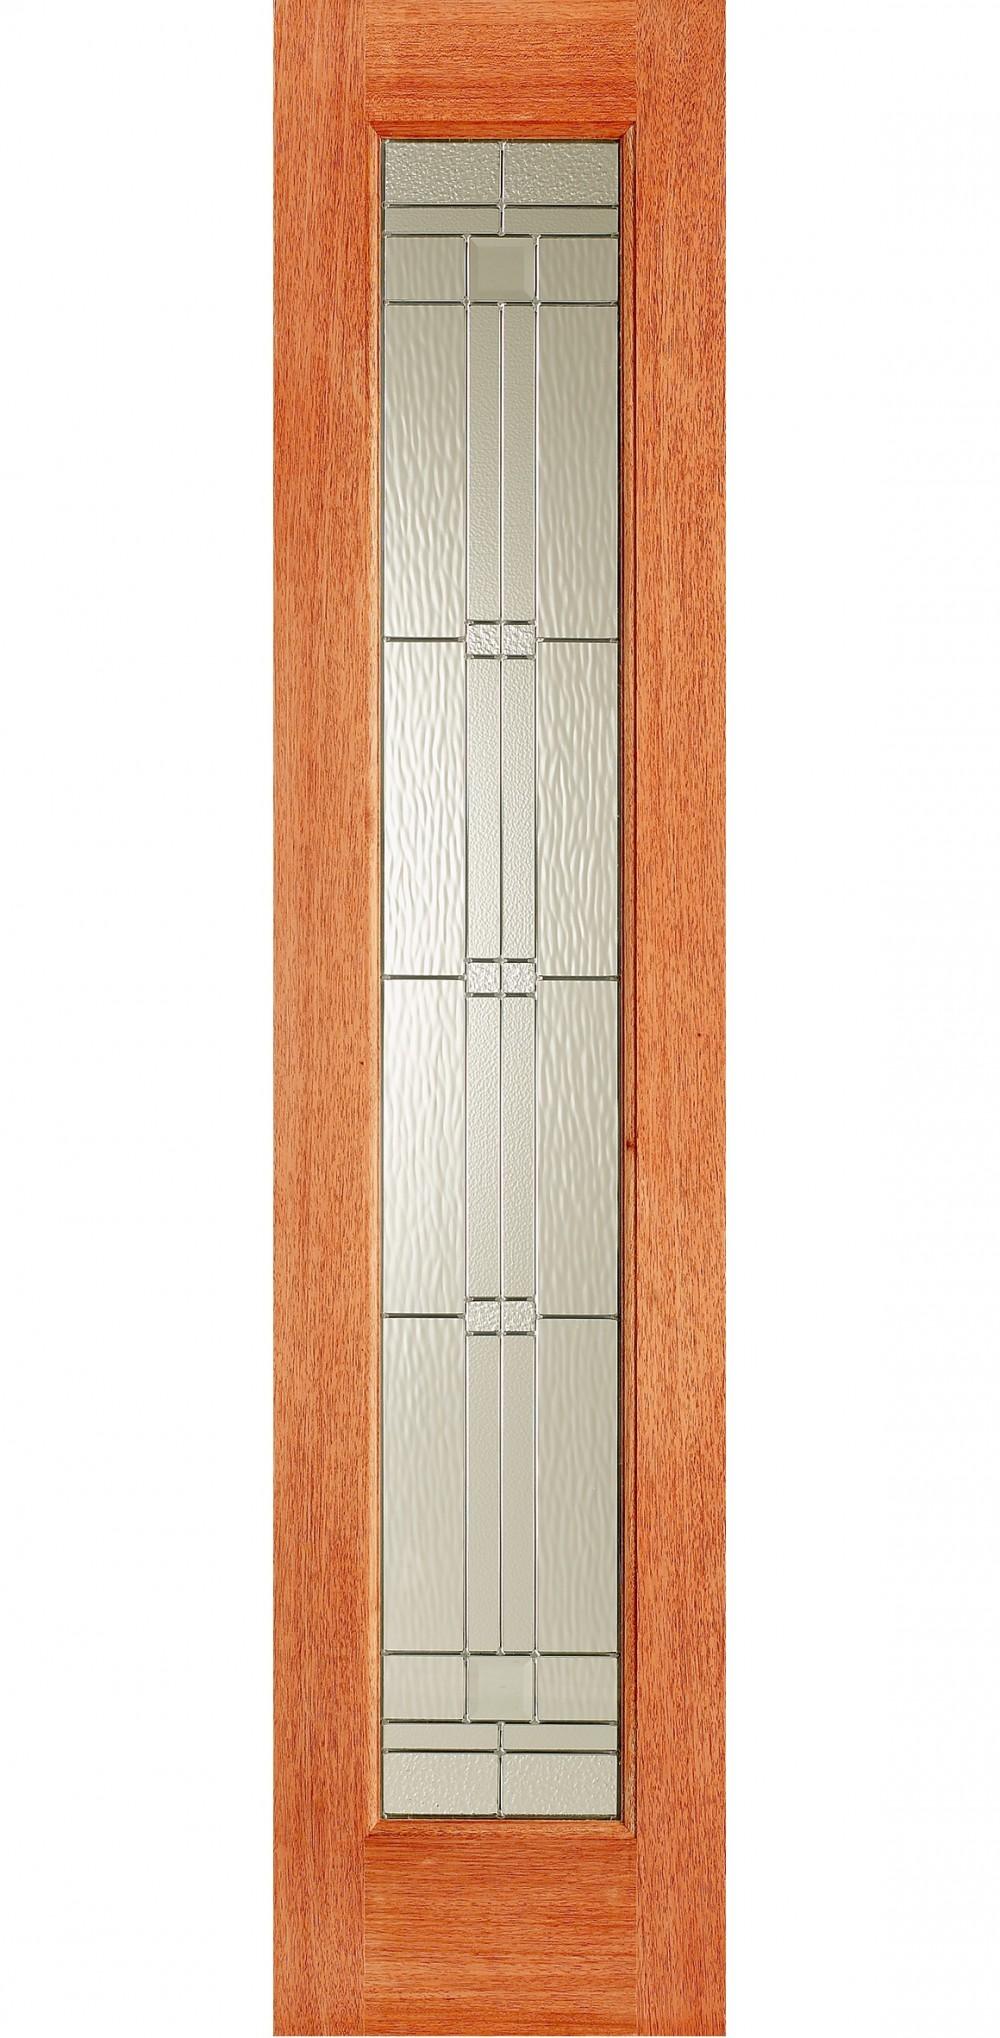 Elegant Ig Zinc Leaded Hardwood Sidelight Trading Doors